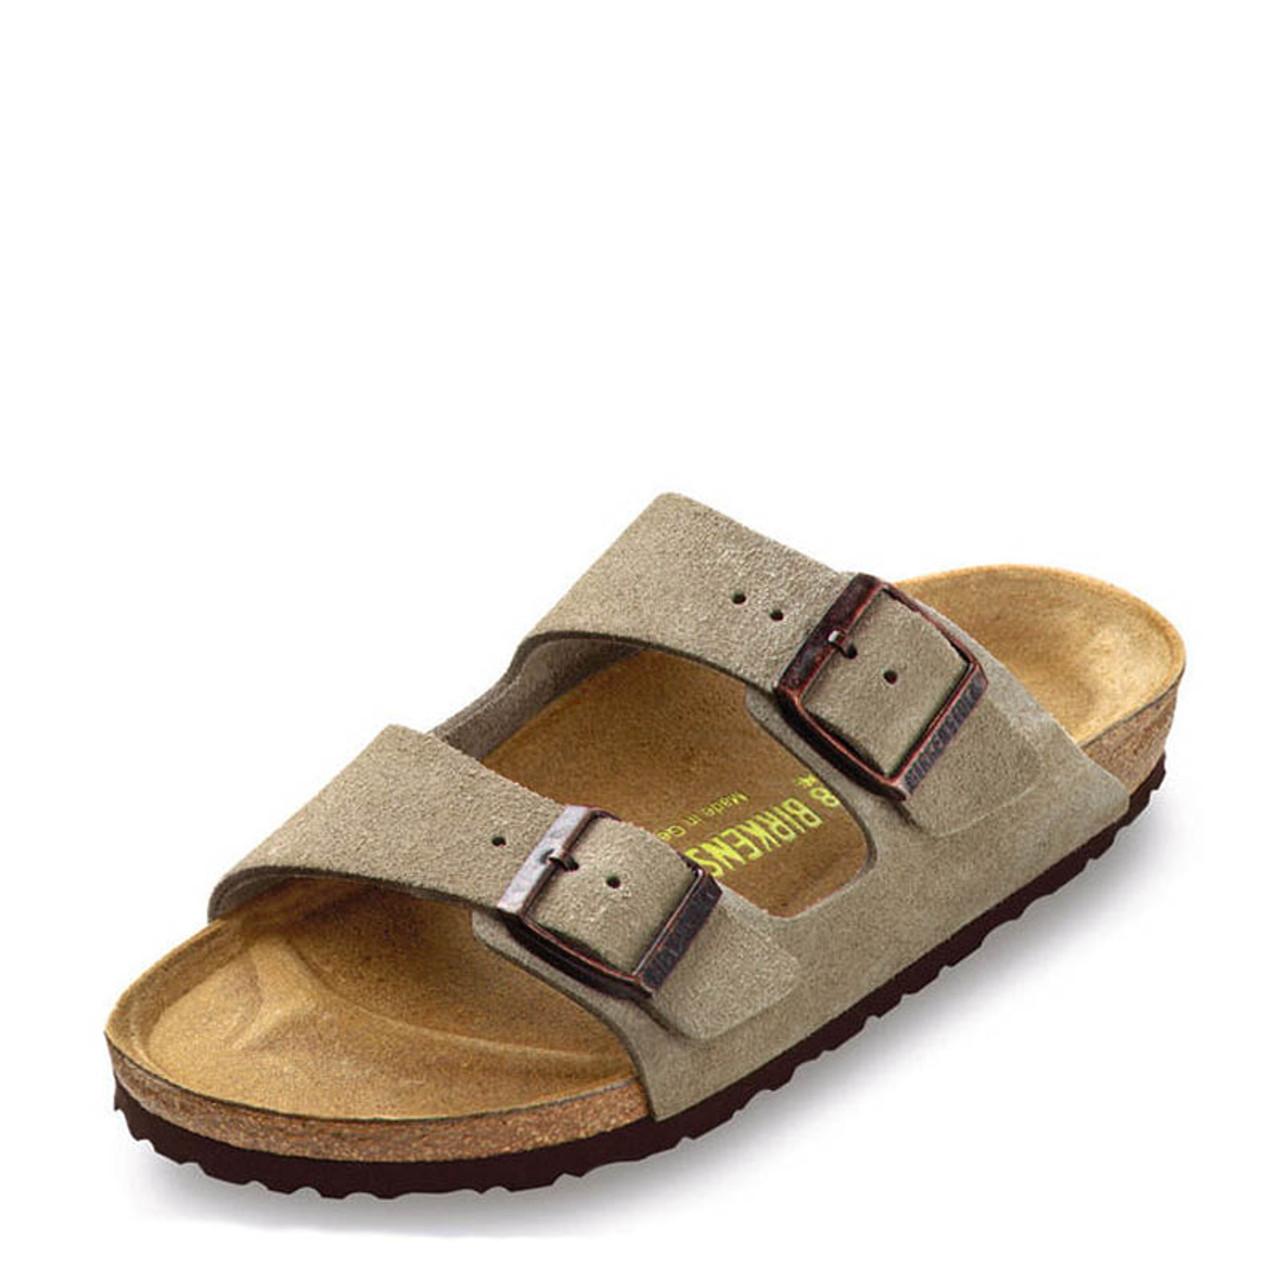 birkenstock women 39 s arizona taupe sandals family. Black Bedroom Furniture Sets. Home Design Ideas